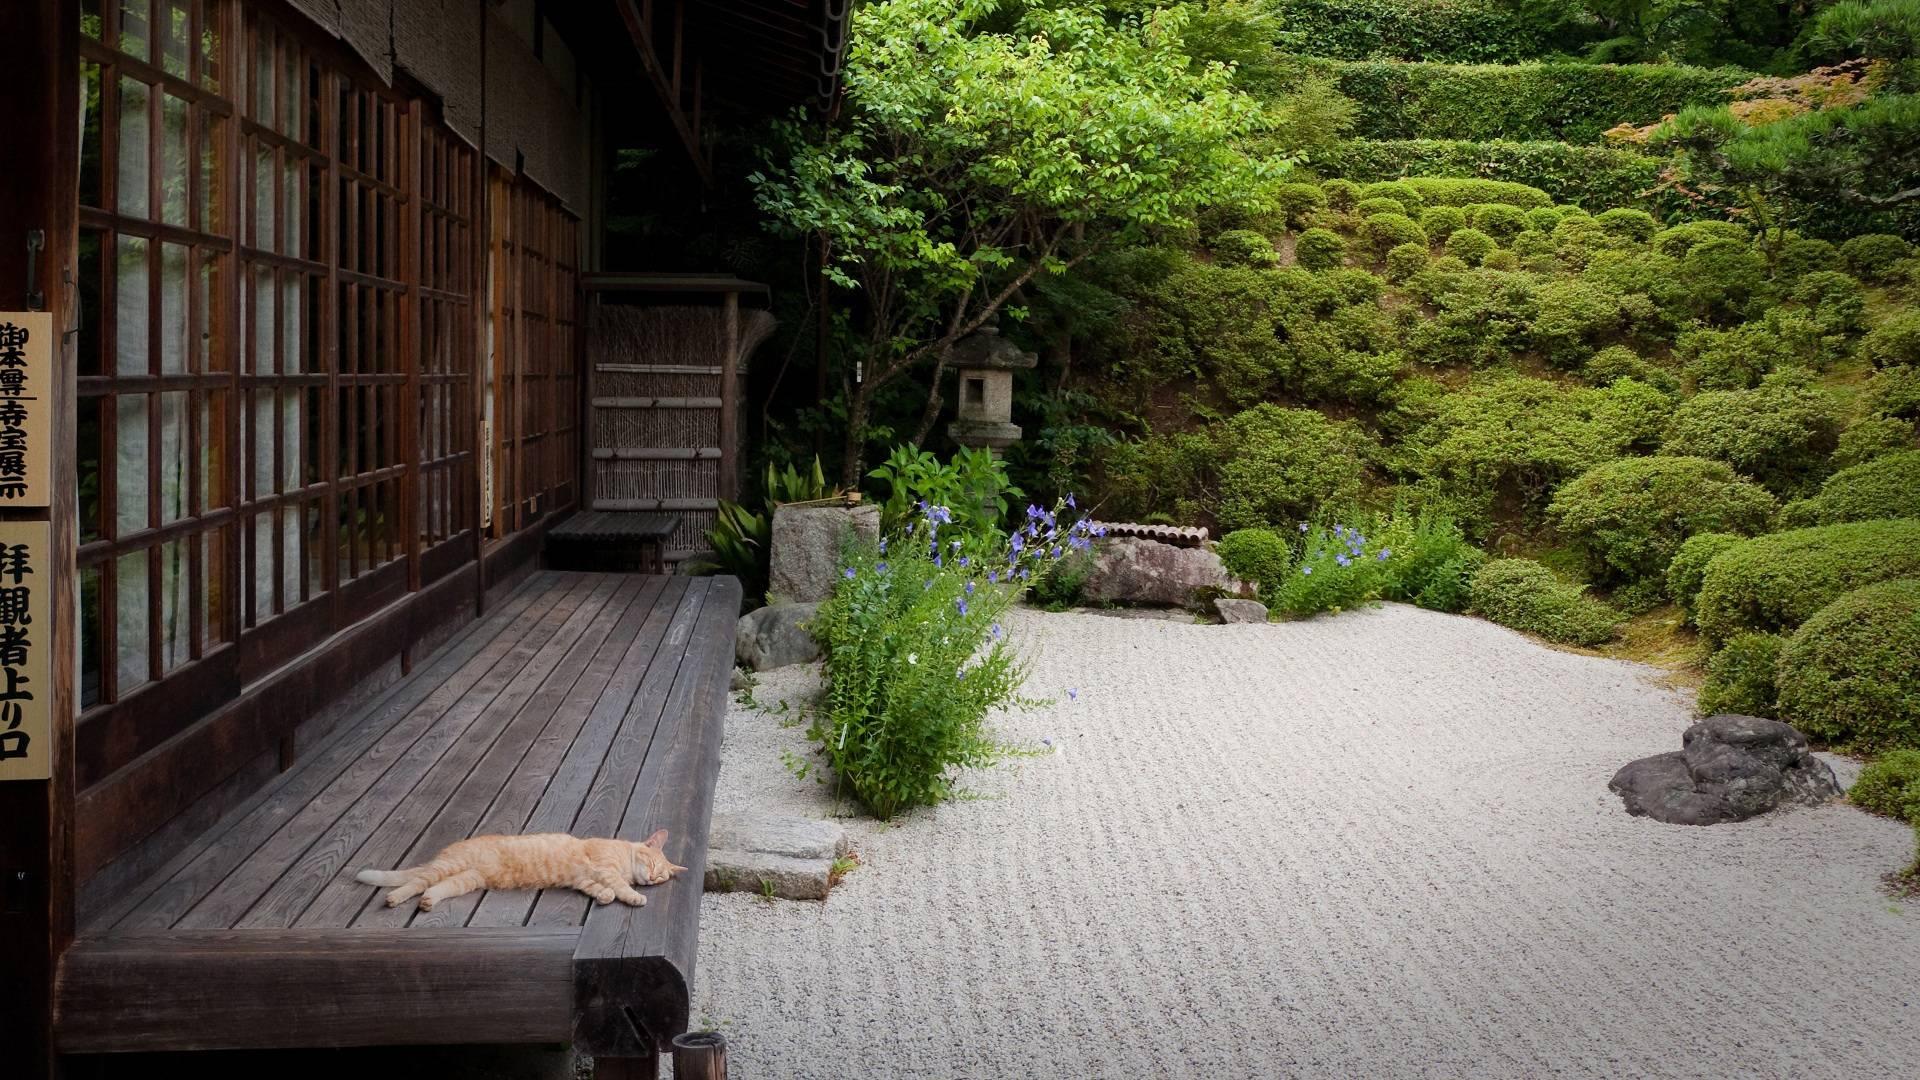 garden wallpaper zen 1920x1080px - photo #8